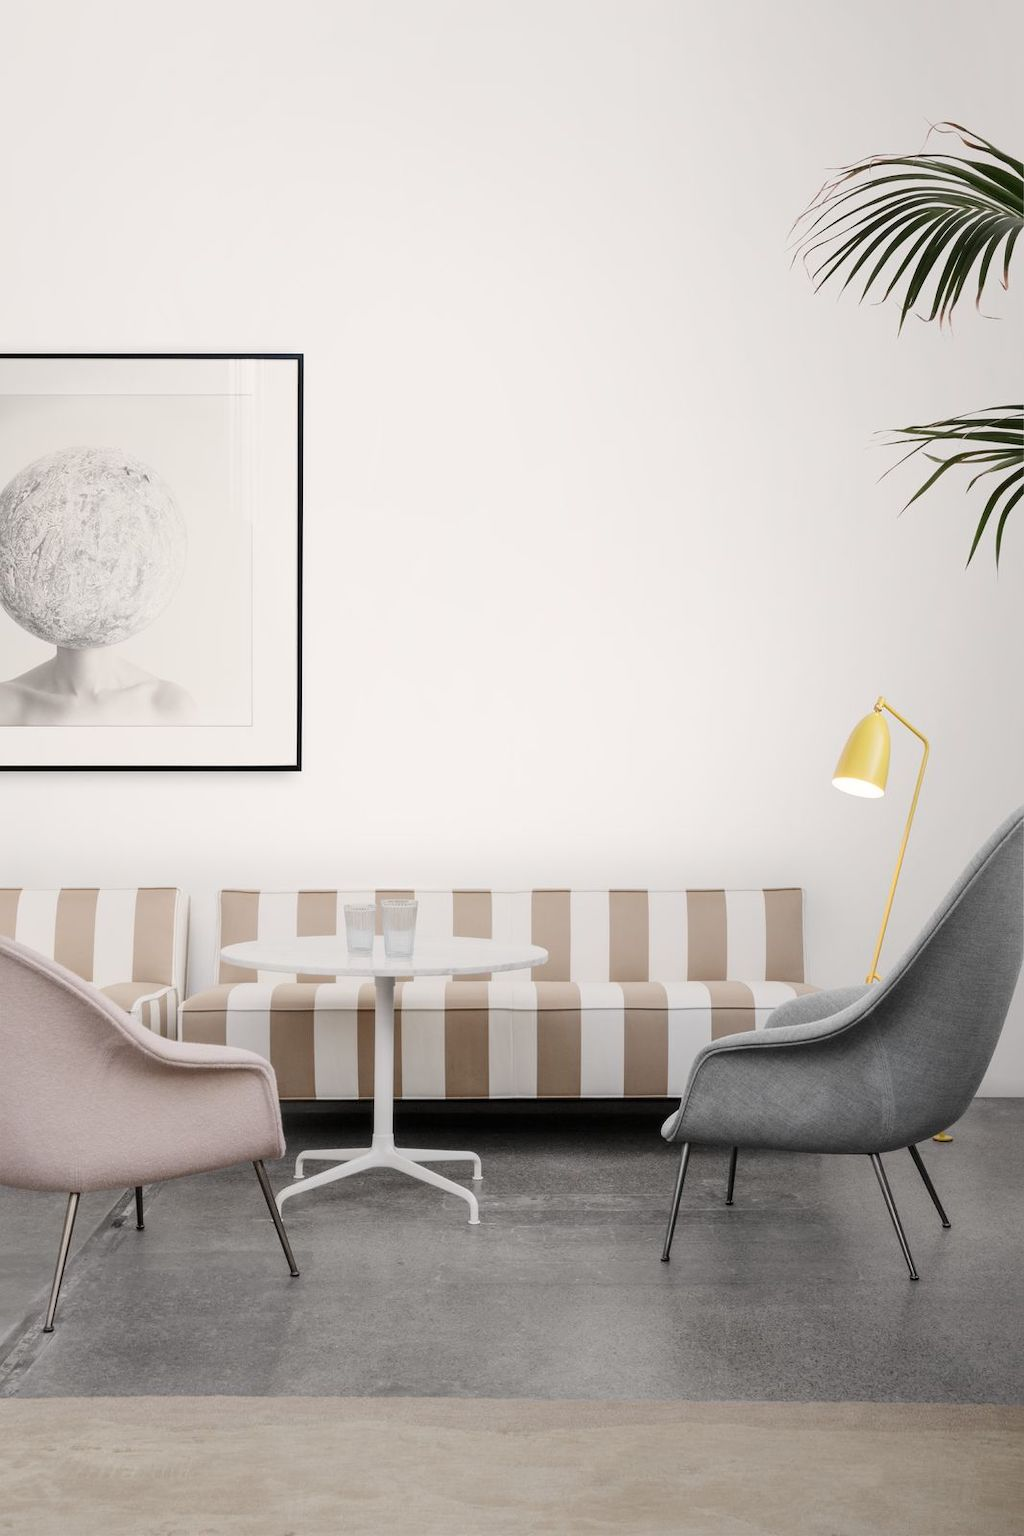 Designer im Portrait: Greta Grossman